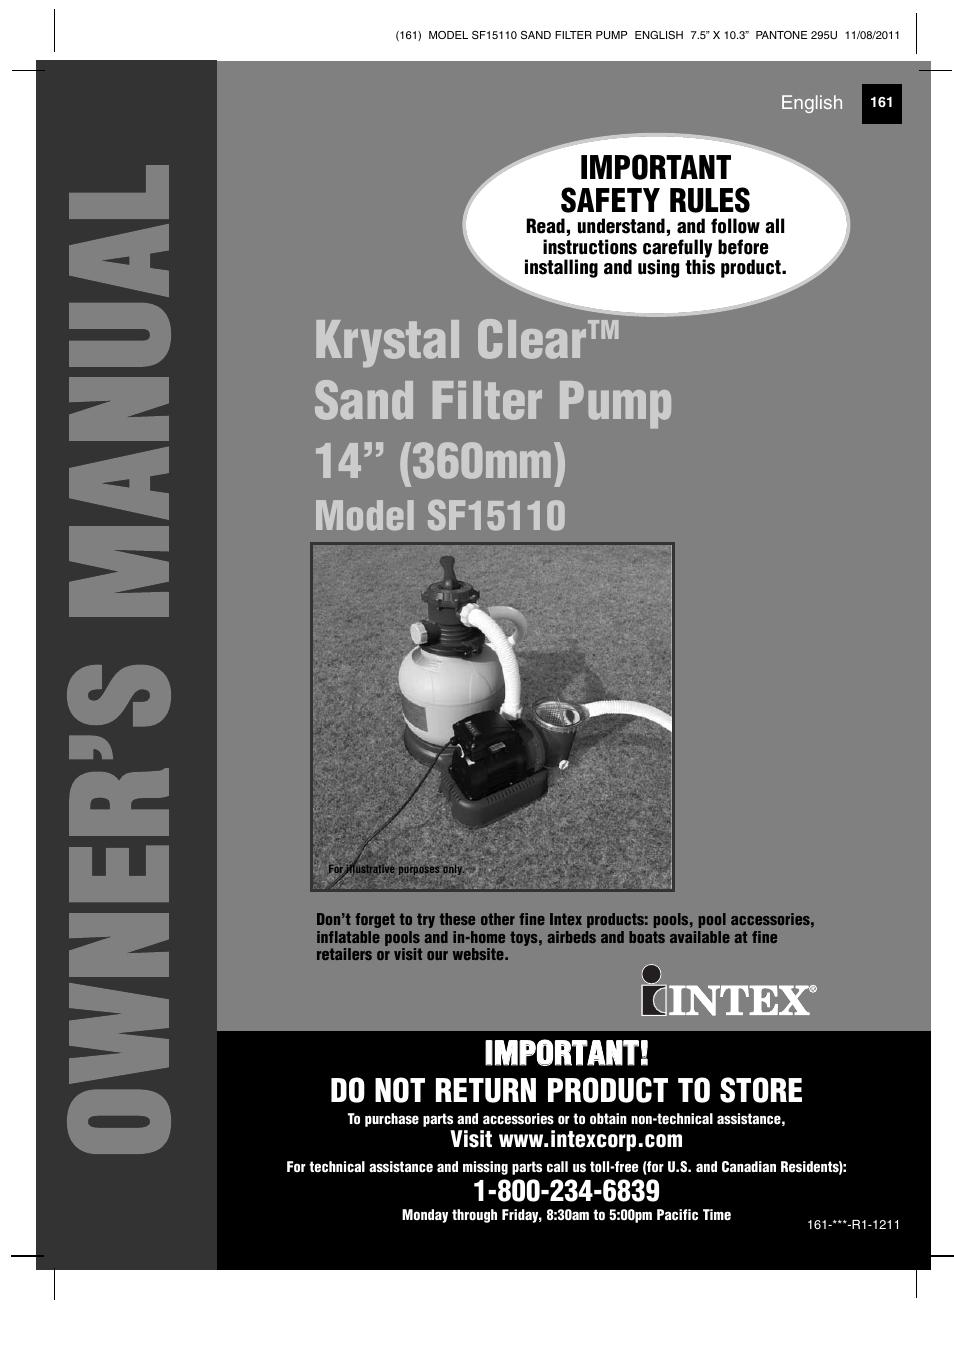 intex sf15110 krystal clear 2012 user manual 30 pages rh manualsdir com Intex Pool Pumps intex sand filter pump model sf15110 manual